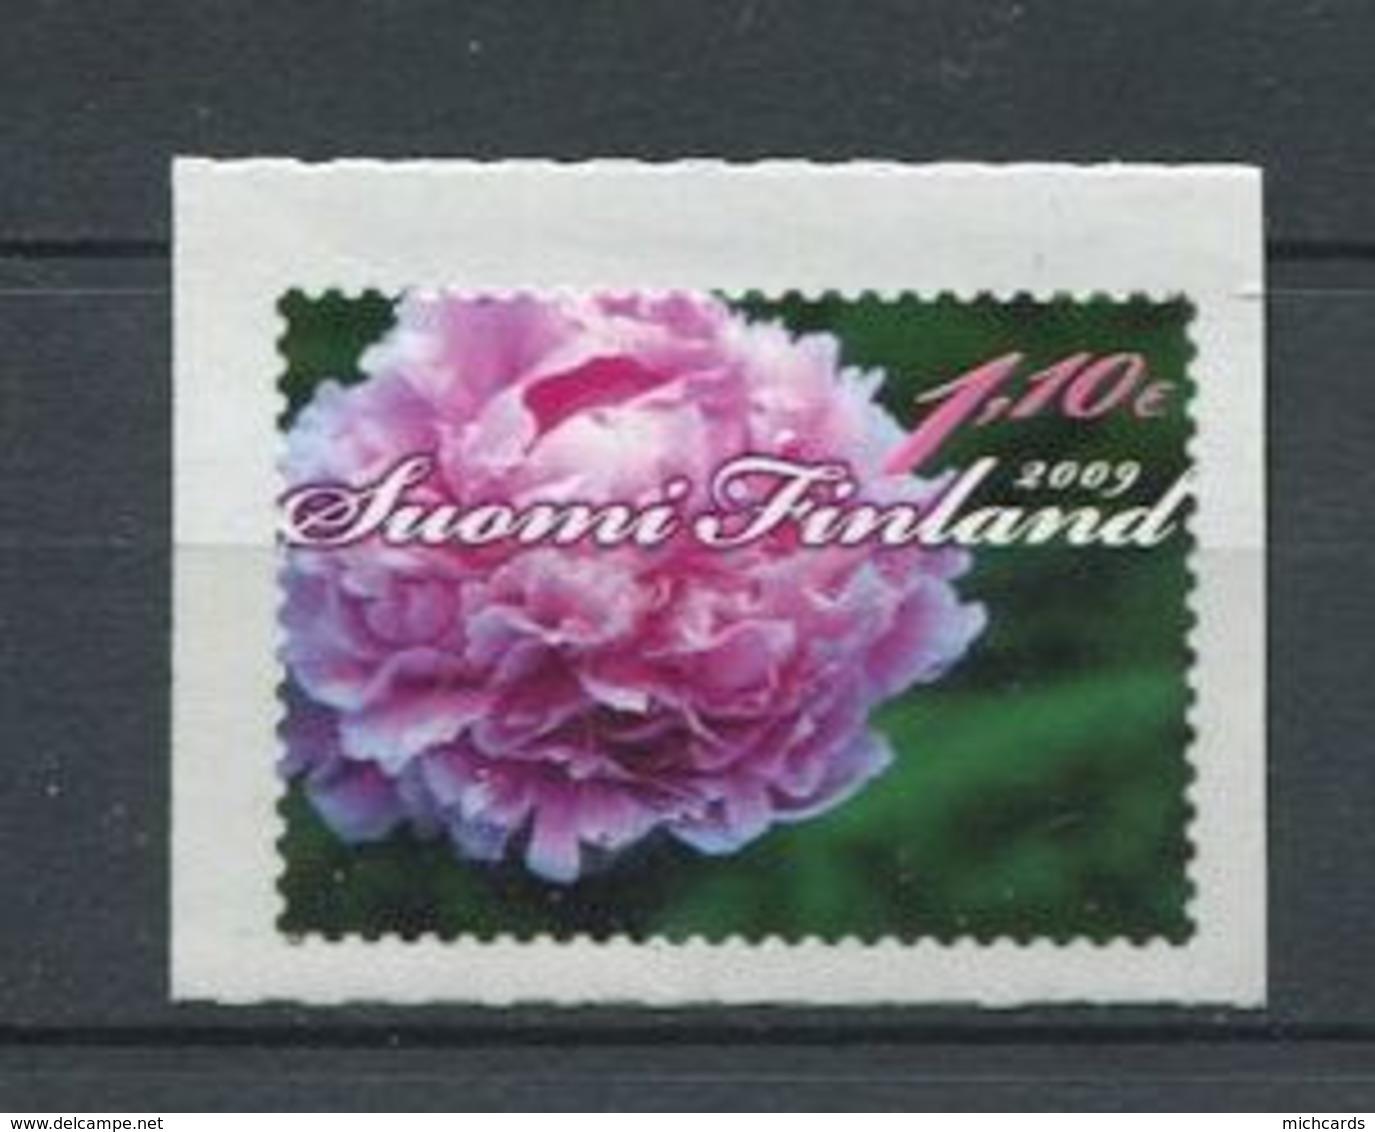 GER - FINLANDE 2009 - Yvert 1918 Adhesif - Fleur Pivoine De Chine - Neuf ** (MNH) Sans Trace De Charniere - Unused Stamps